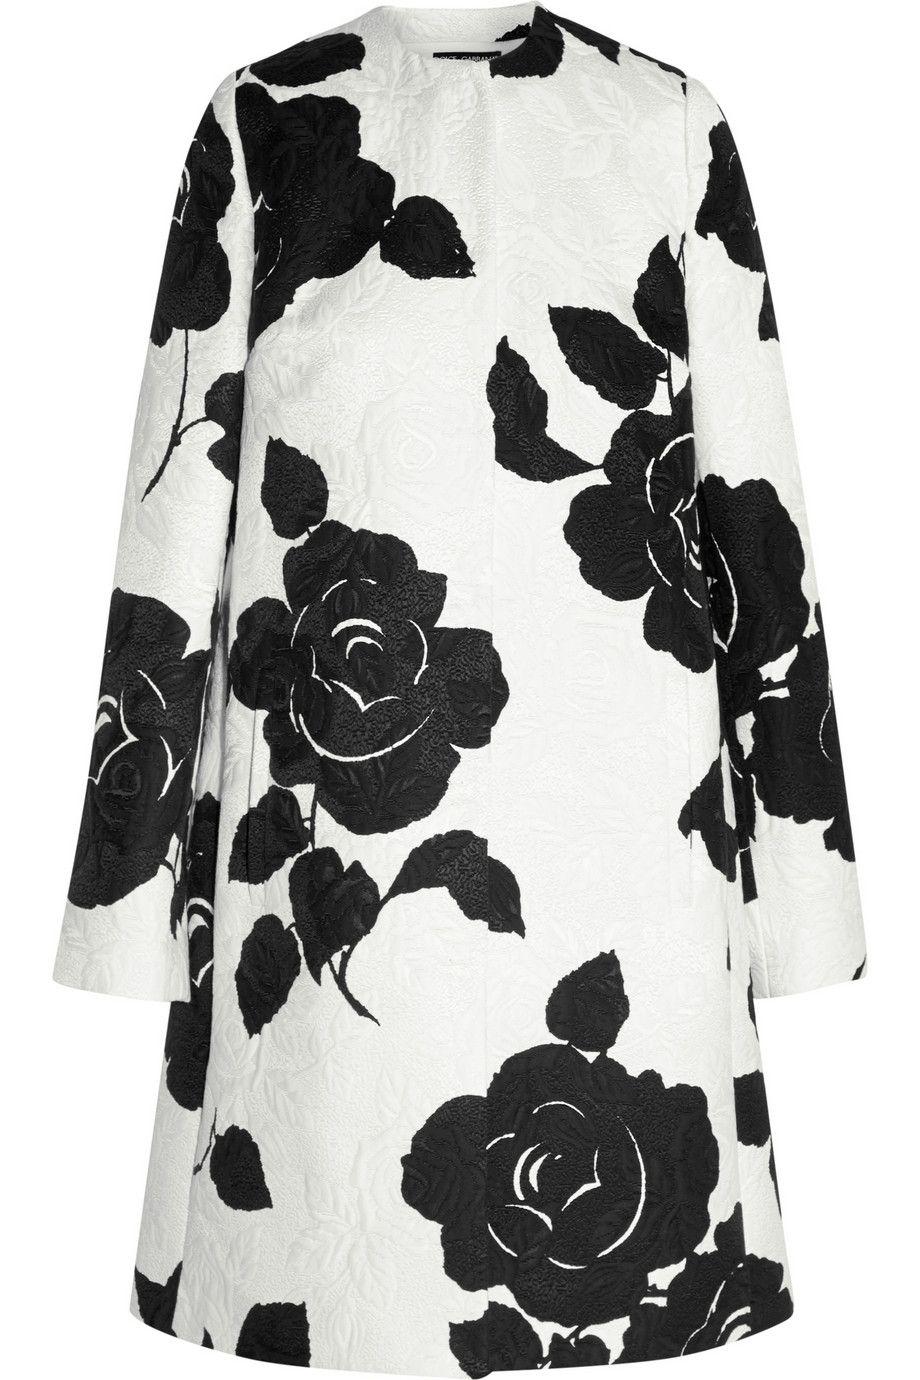 53e0cd10b90 Dolce & Gabbana | Floral-print cotton-blend jacquard coat | NET-A-PORTER.COM